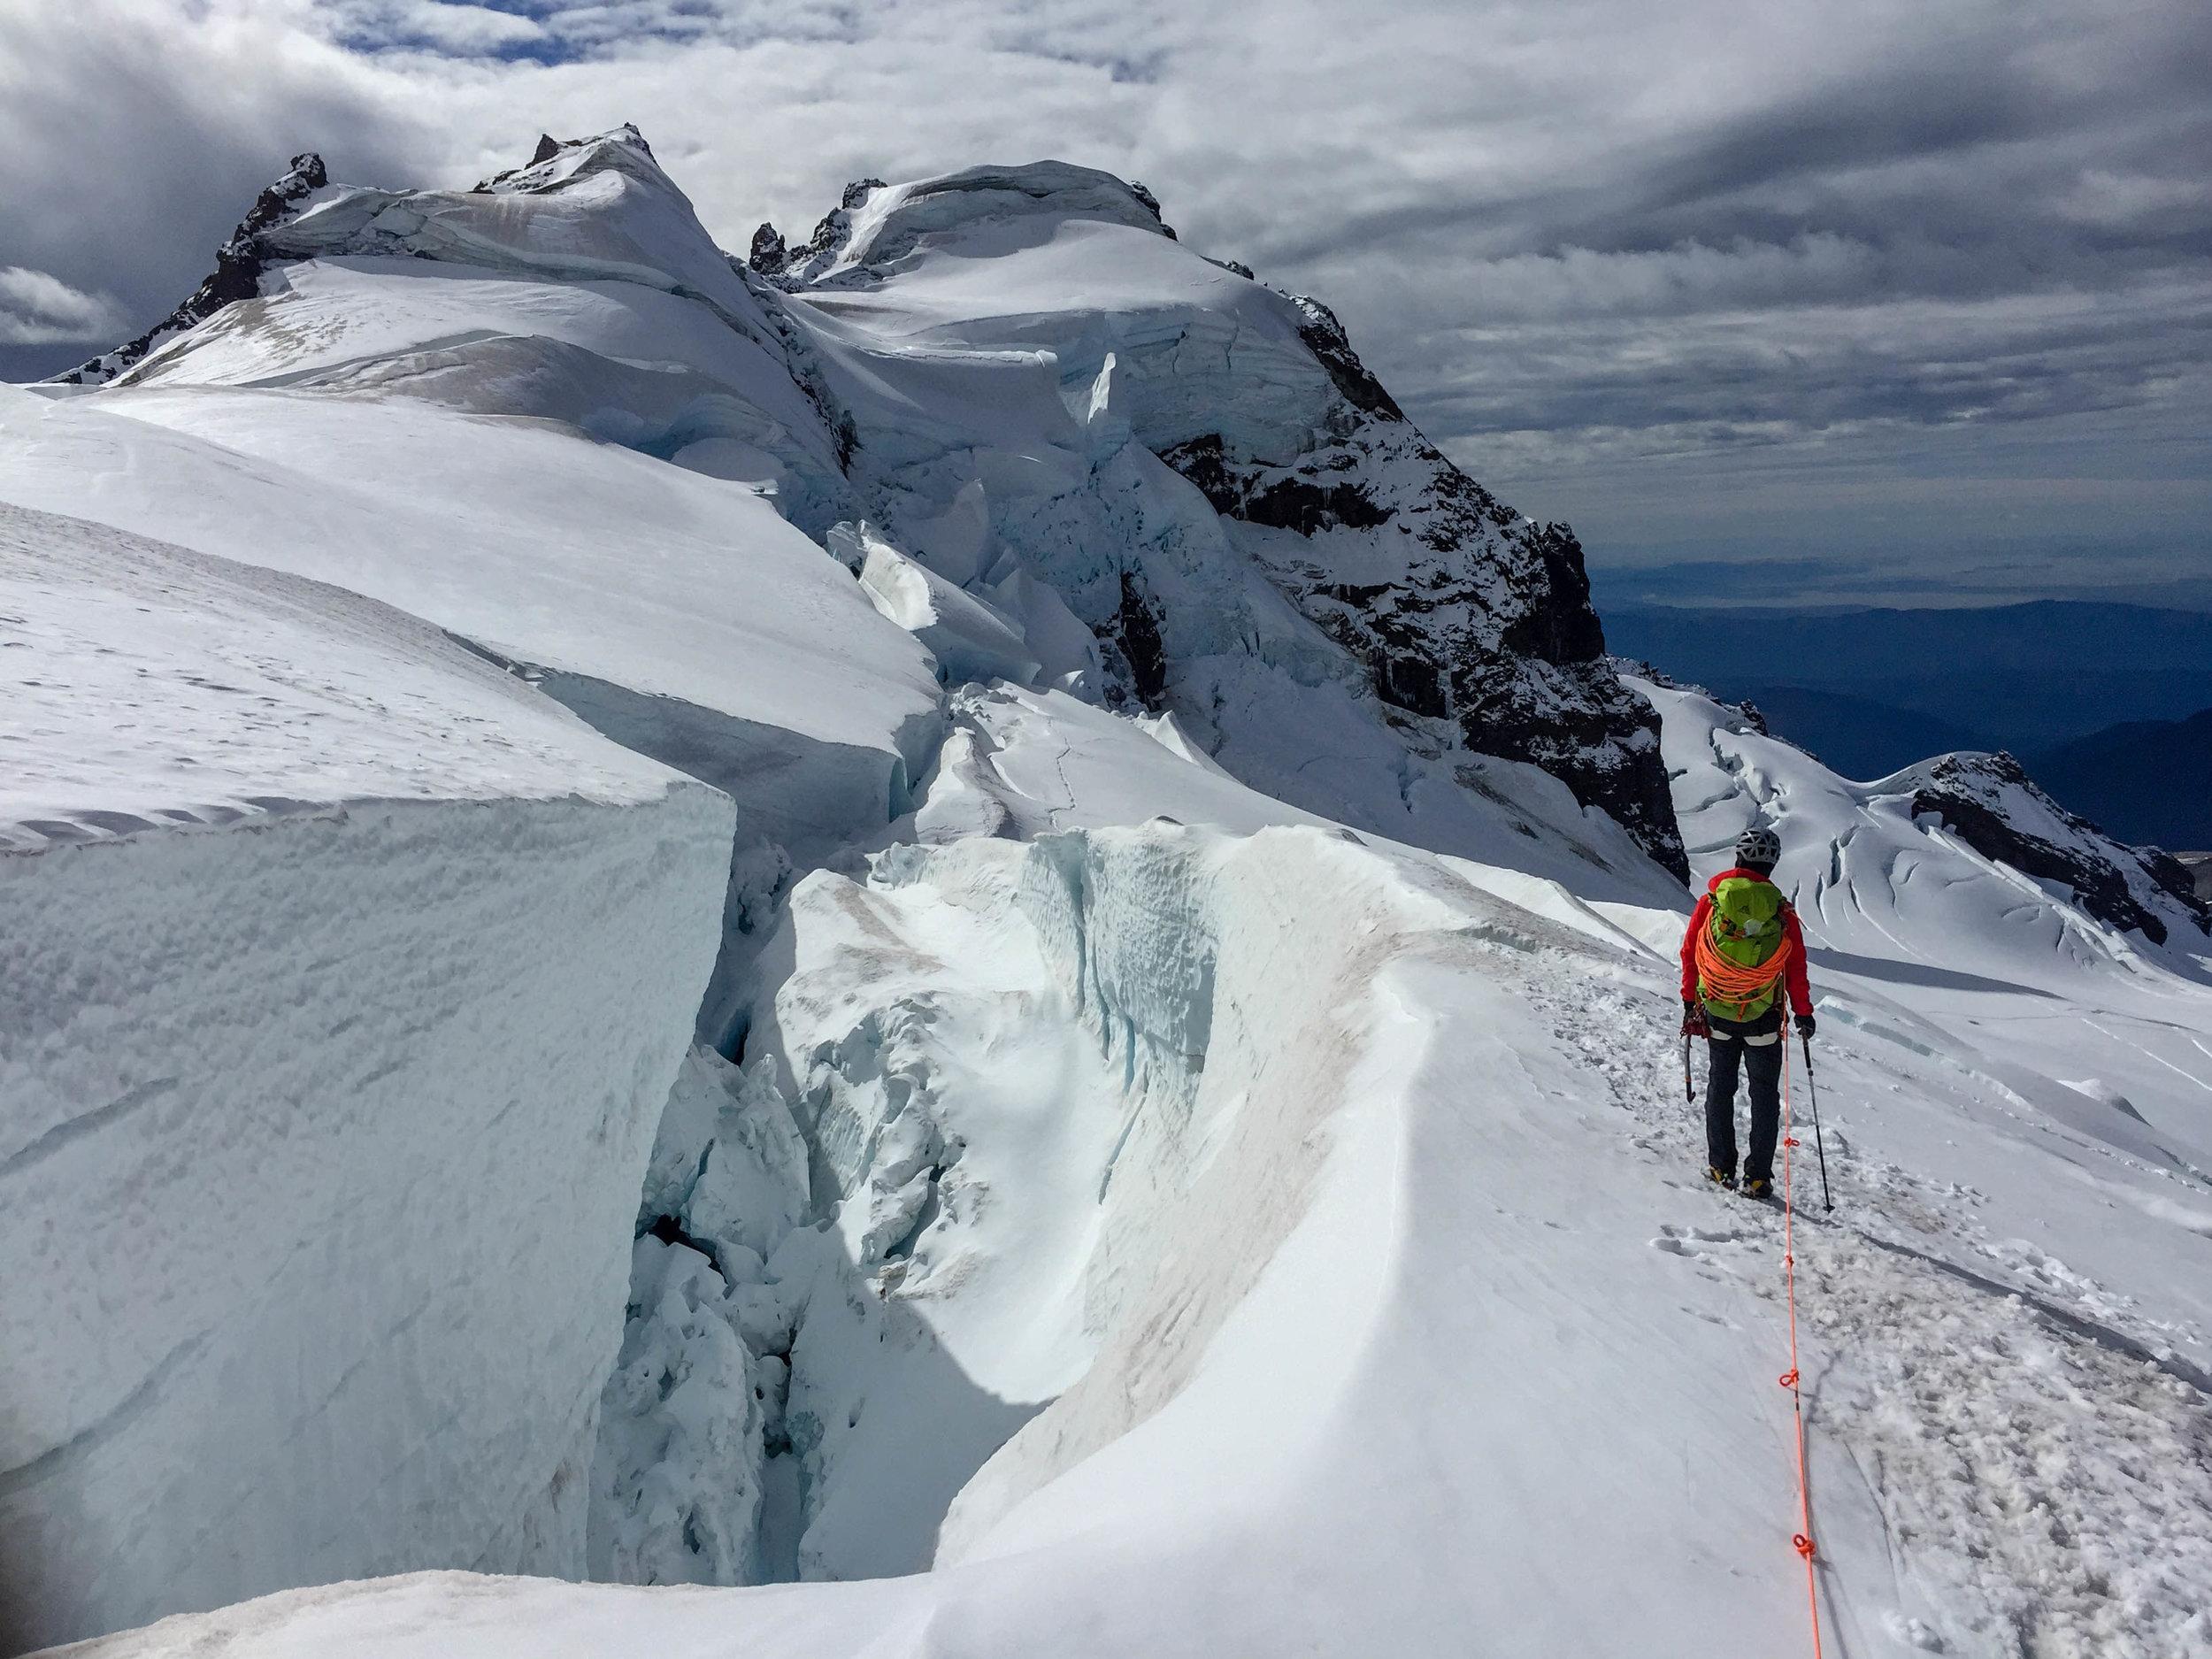 Descending from the North Ridge of Mount Baker. Photo credit: Mountain Bureau, LLC.